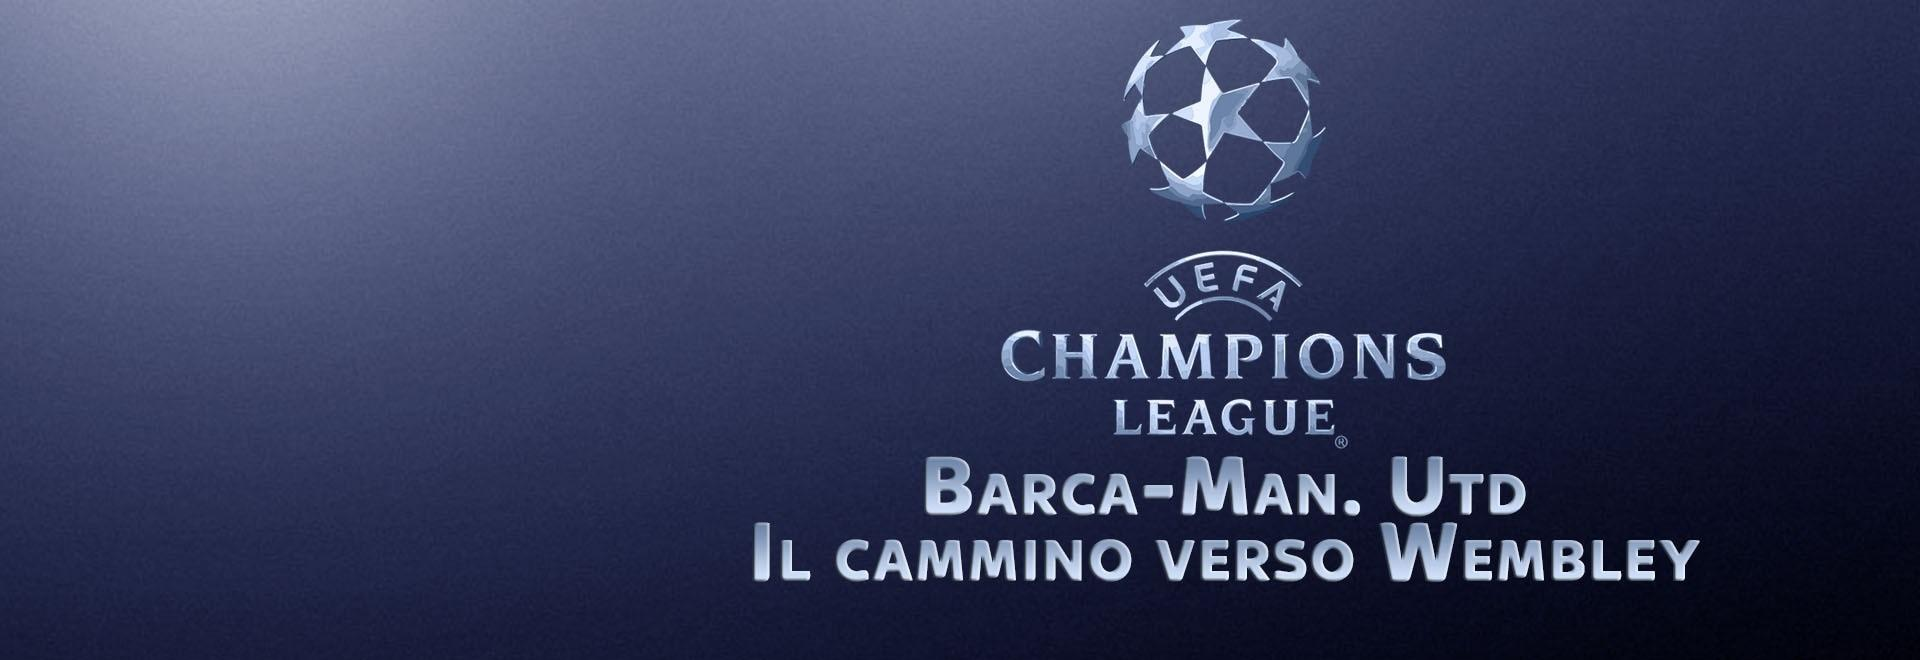 Barca-Man. Utd Il cammino verso Wembley